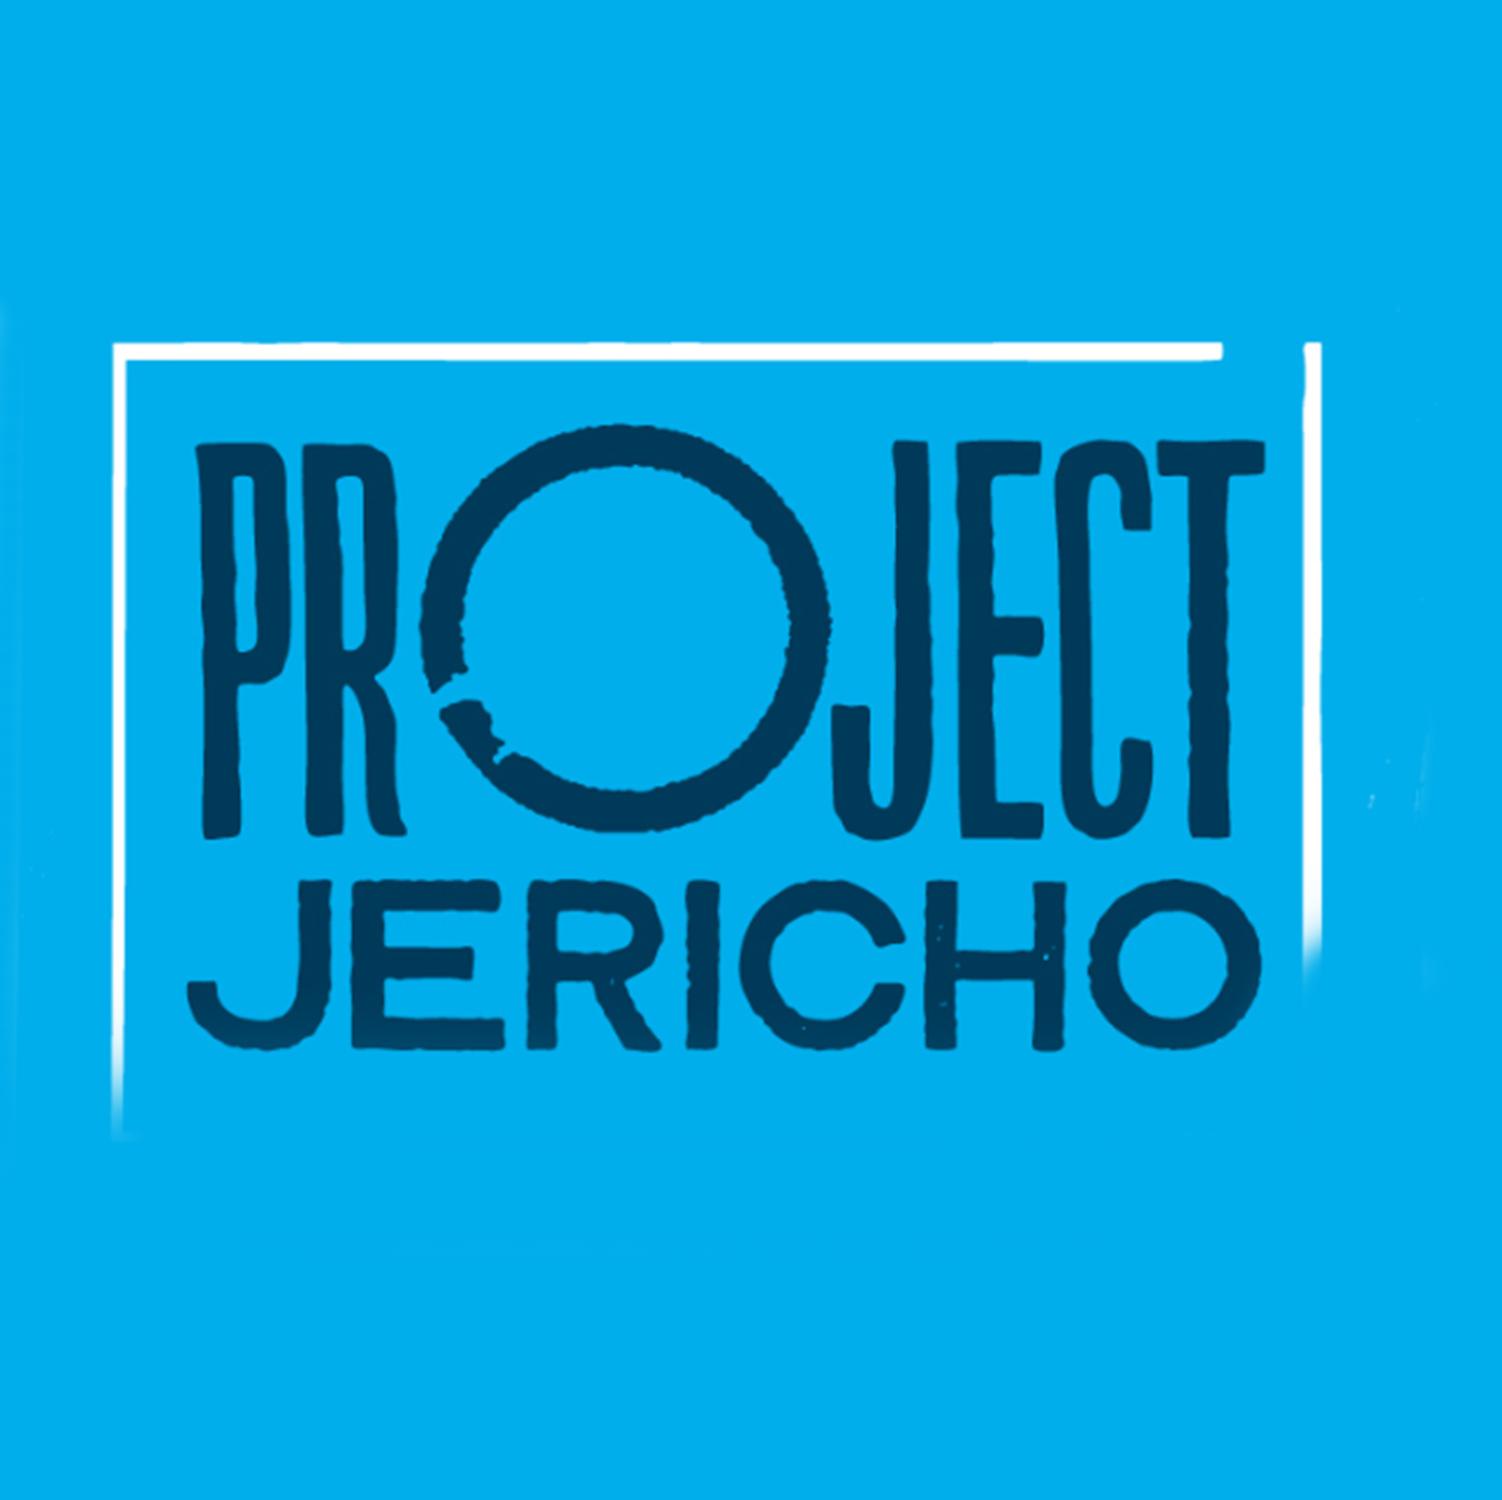 PROJECT JERICHO